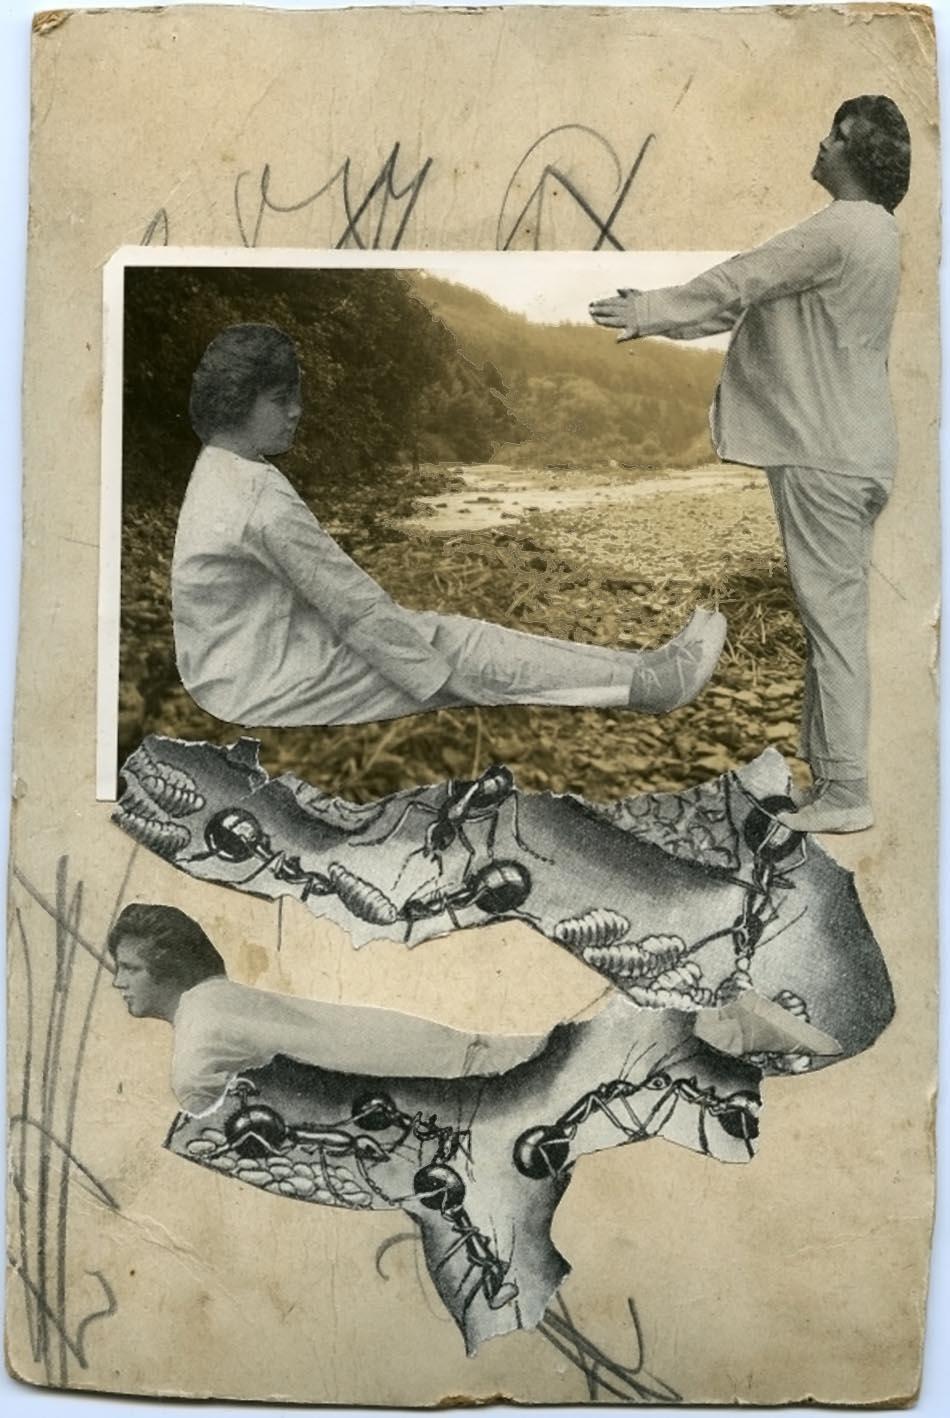 Adriana Muller (Crafty Dogma) untitled3, 2012